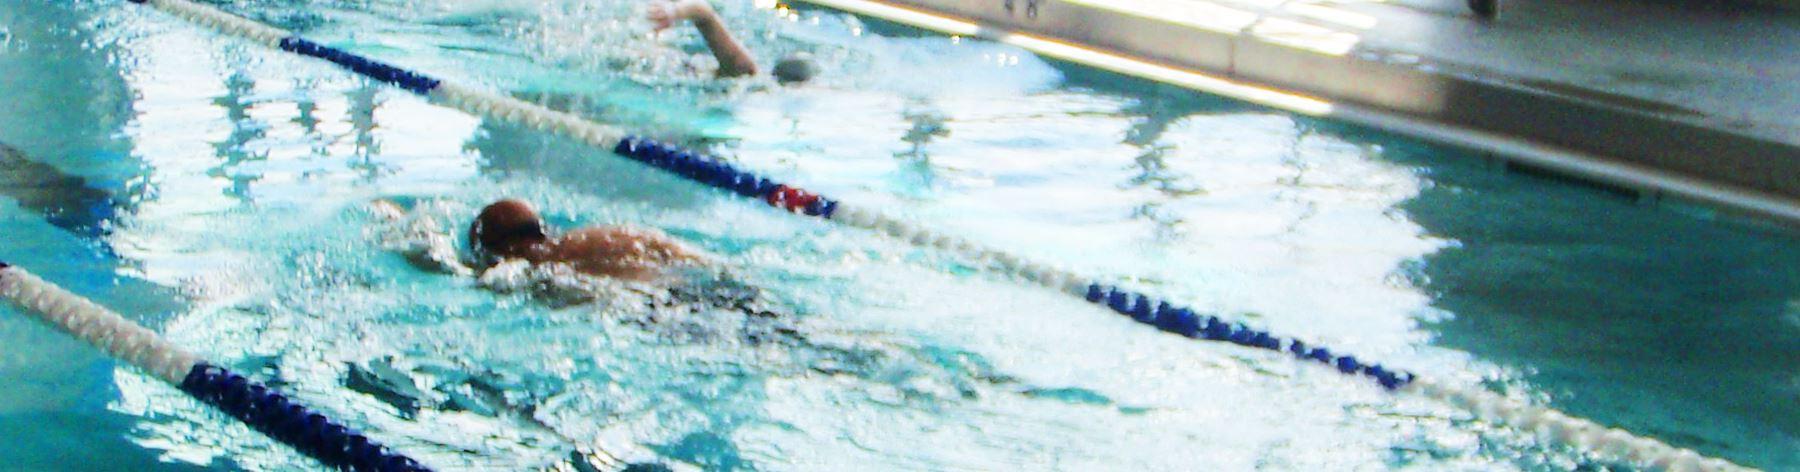 Doling Indoor Aquatic Center   Springfield-Greene County